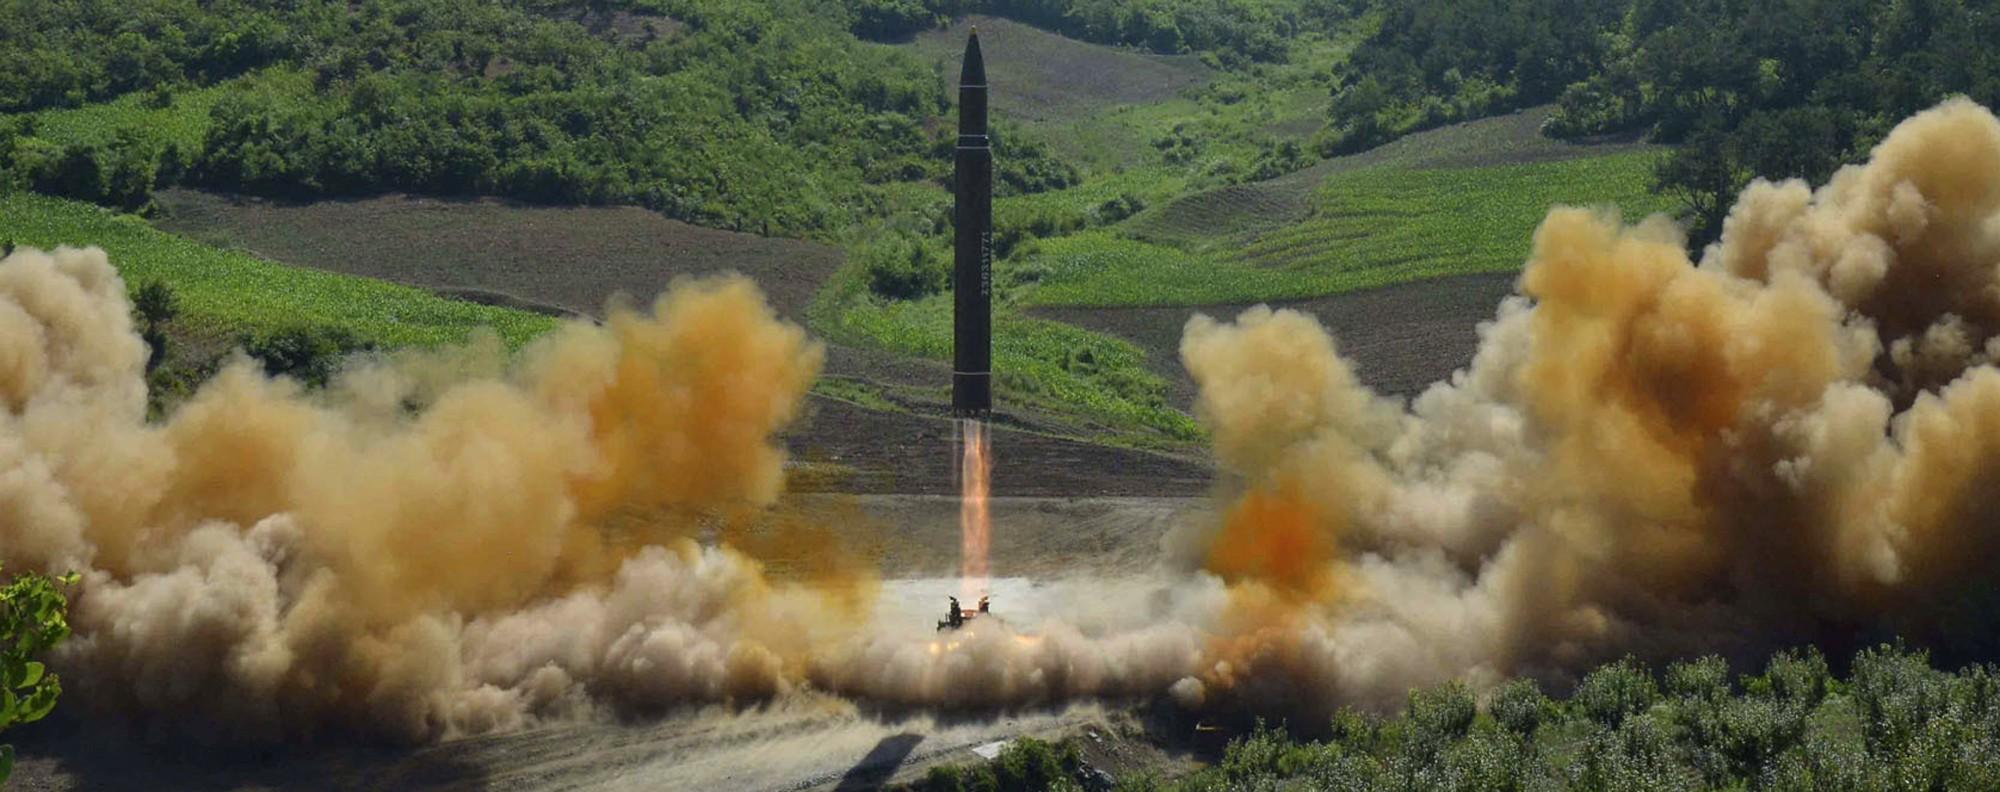 North Korea's ICBM test. Photo: AP